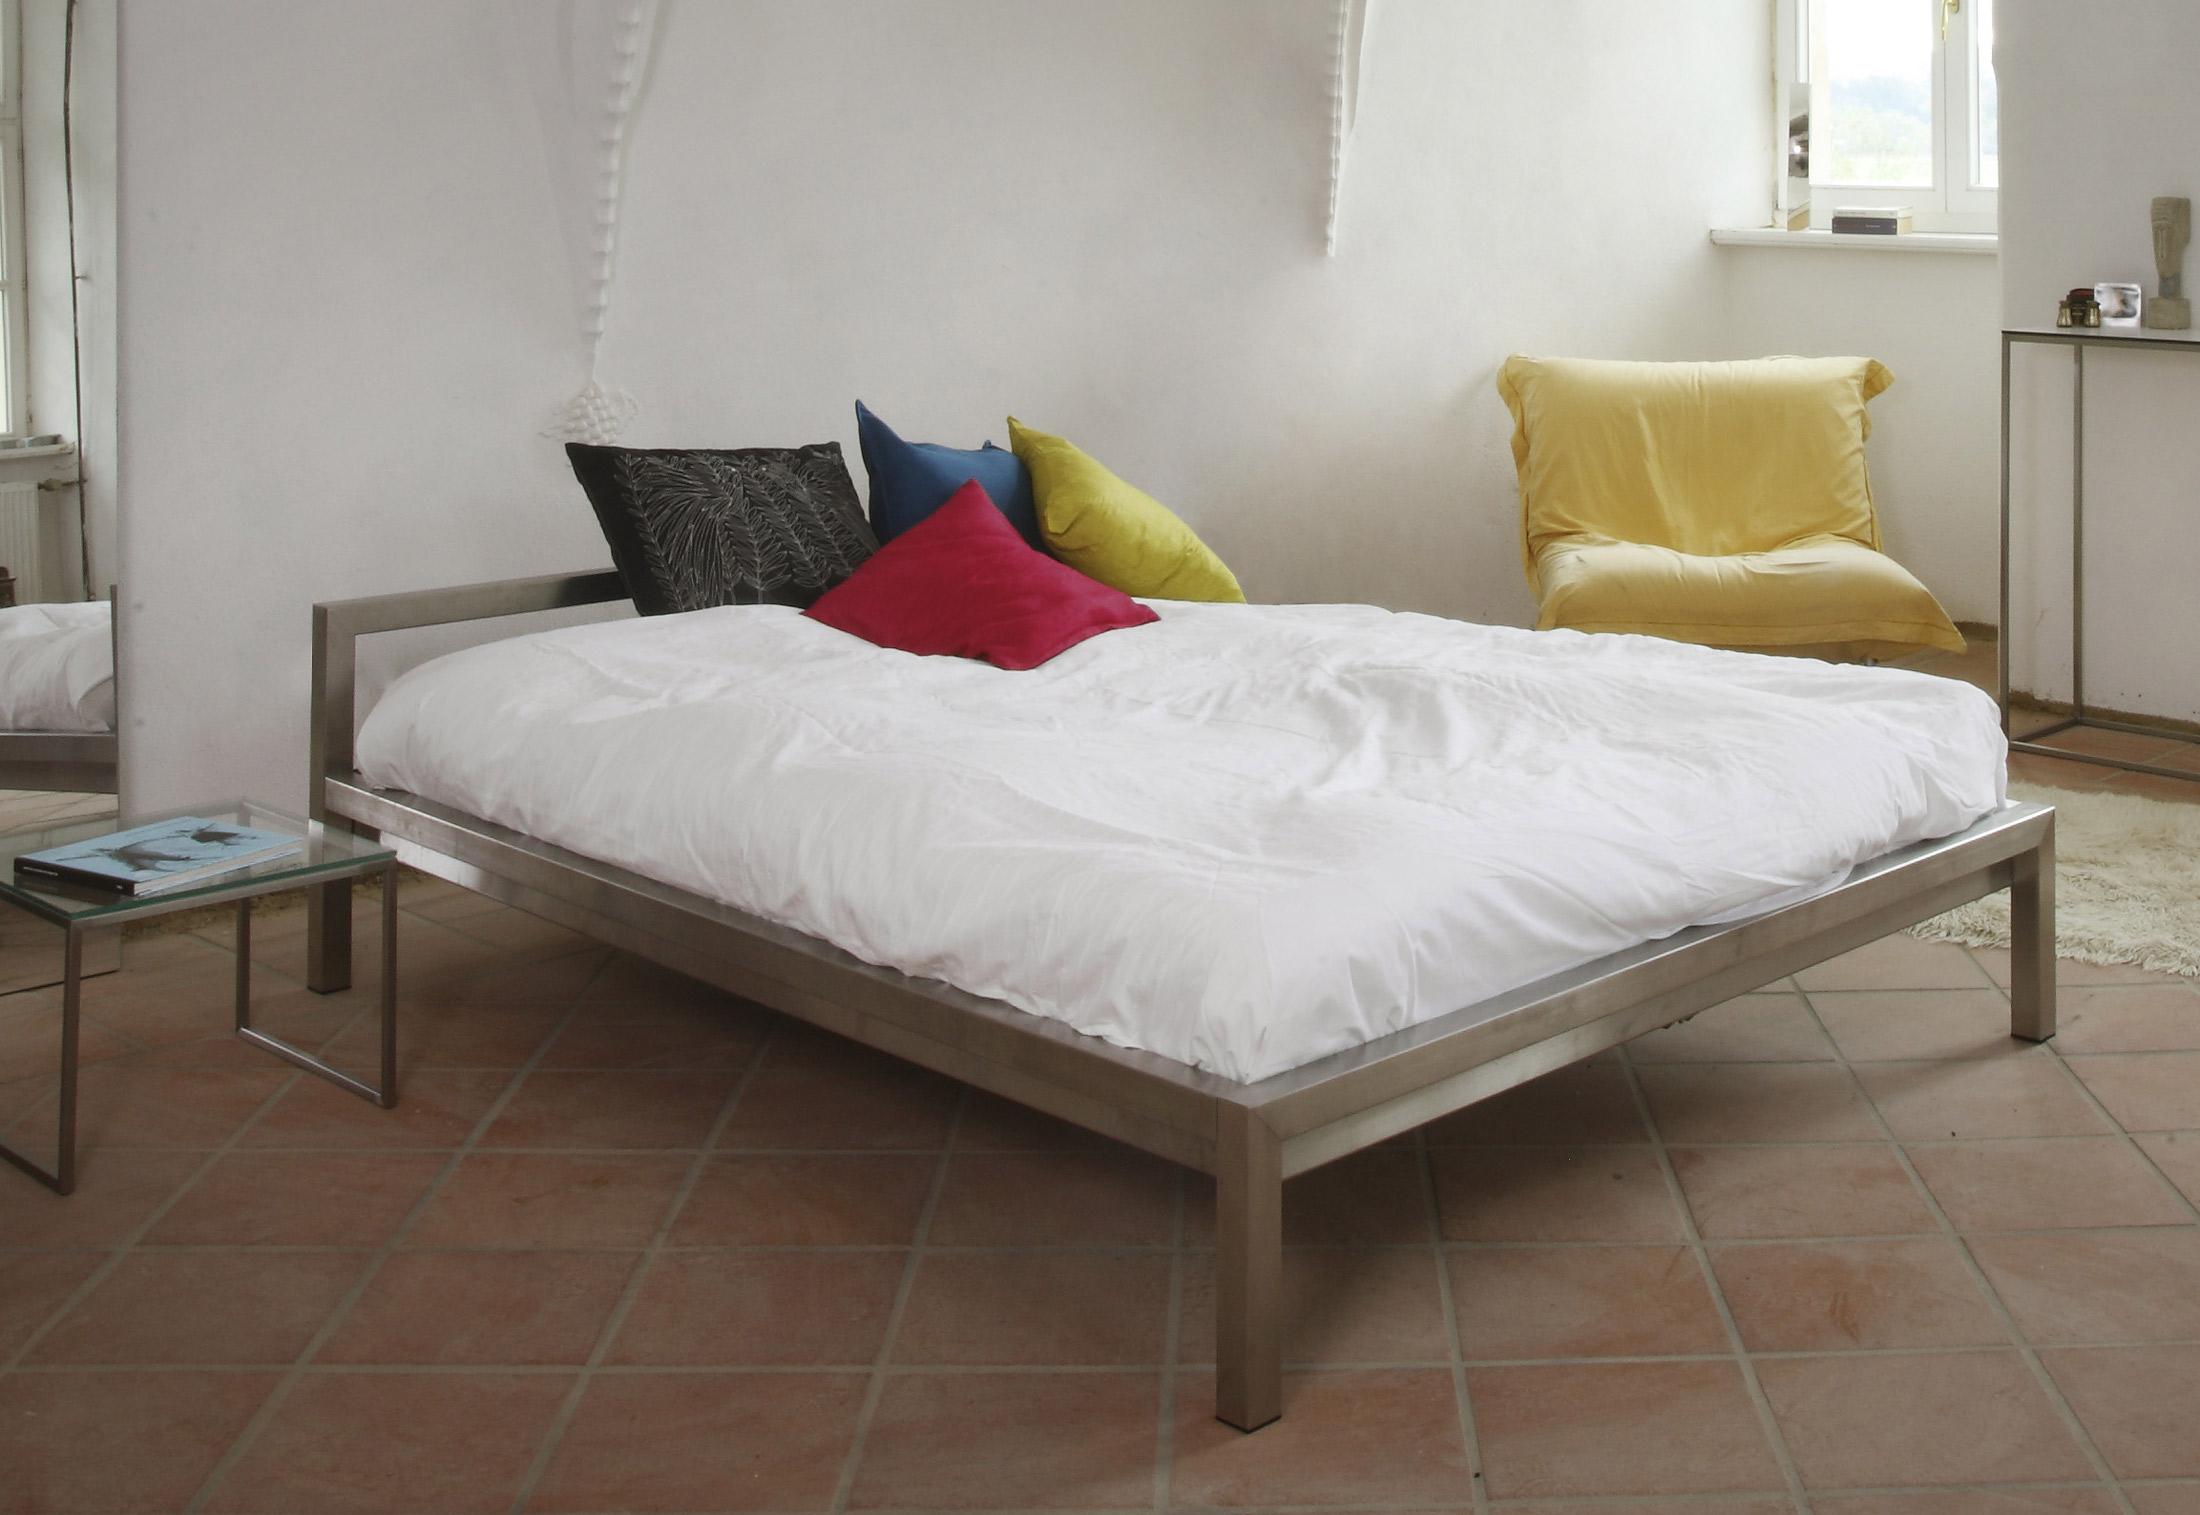 h 666 667 668 669 pure by hans hansen stylepark. Black Bedroom Furniture Sets. Home Design Ideas